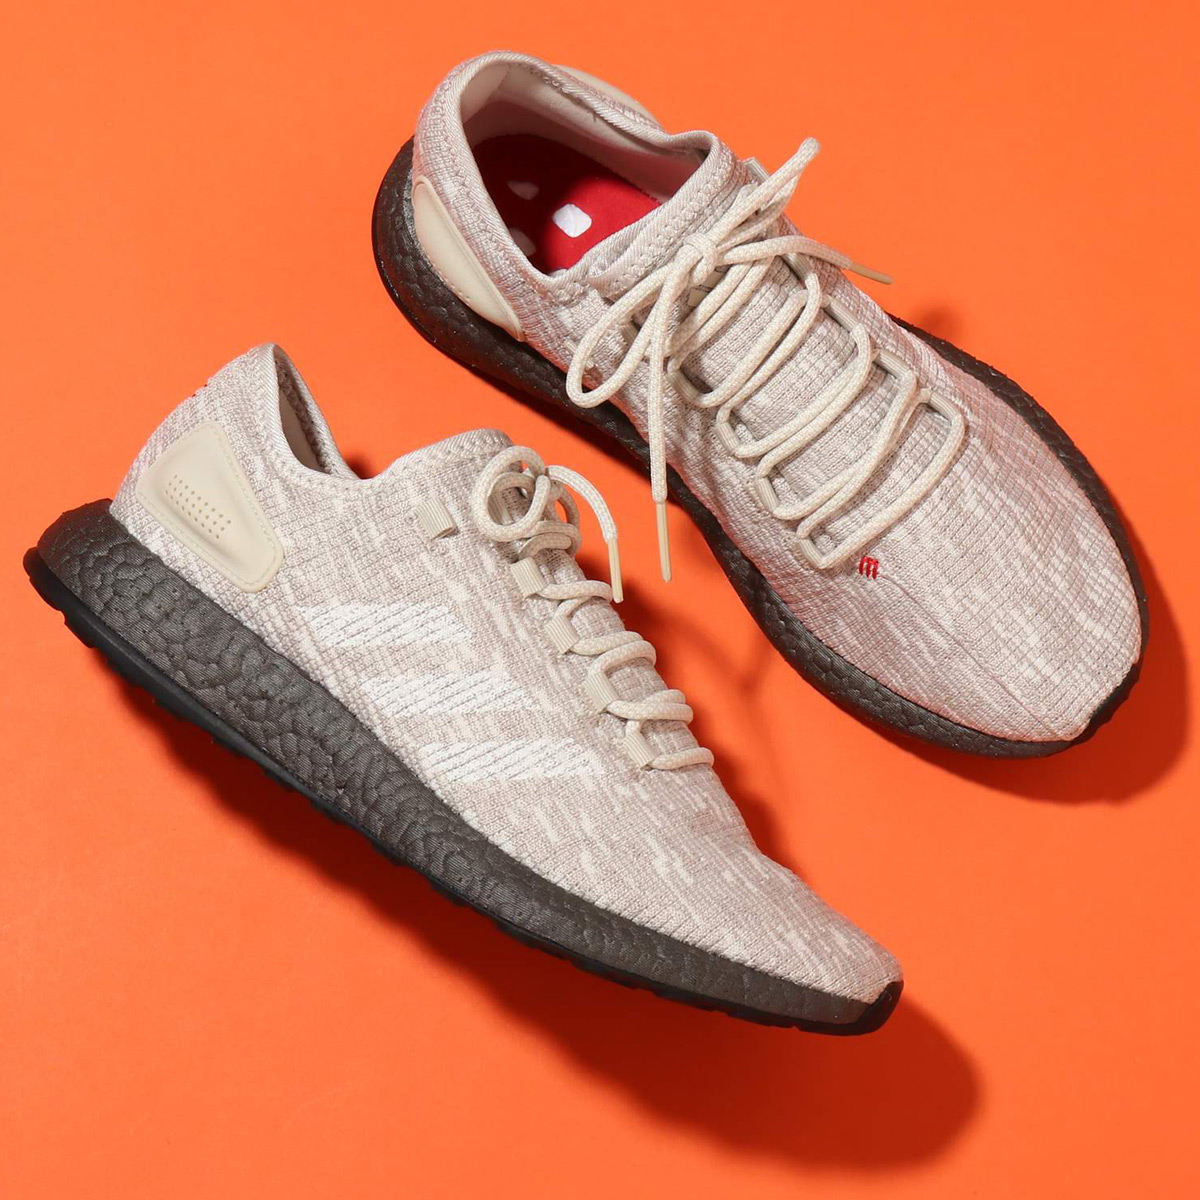 adidas PureBOOST(アディダス ピュアブースト)CLEAR BROWN/RUNNING WHITE/SCARLET【メンズ スニーカー】18FW-S